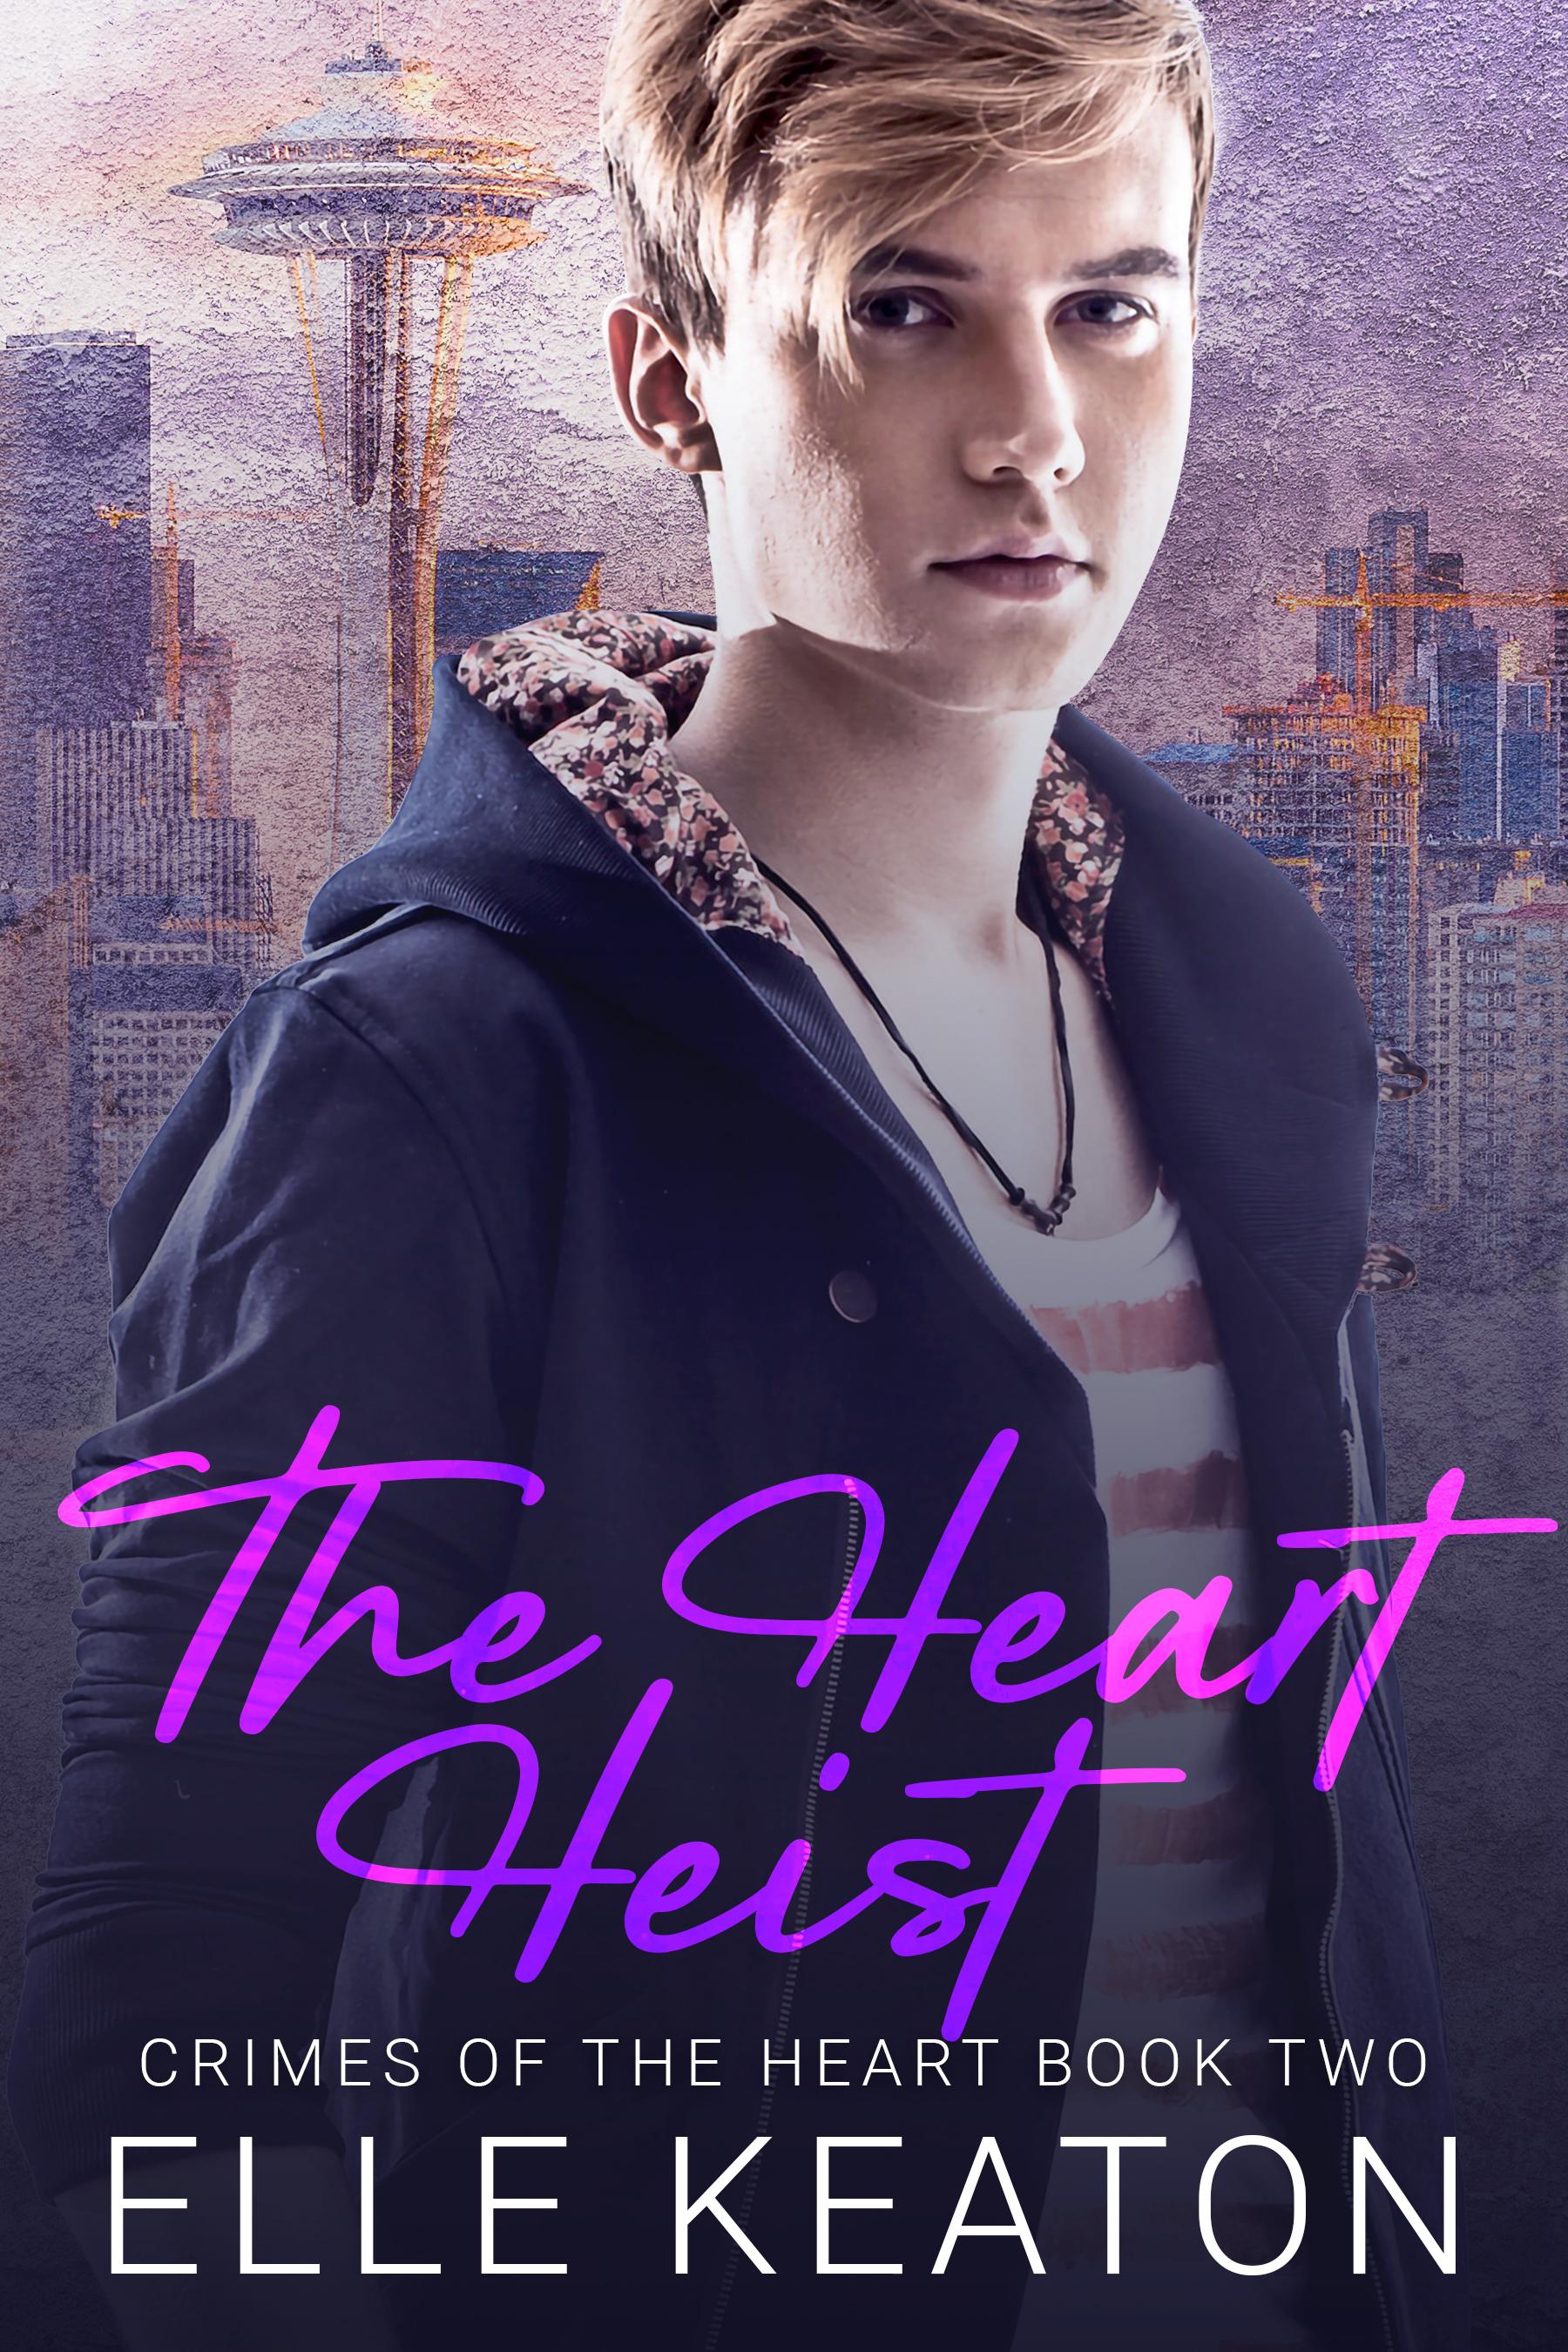 The Heart Heist Ebook